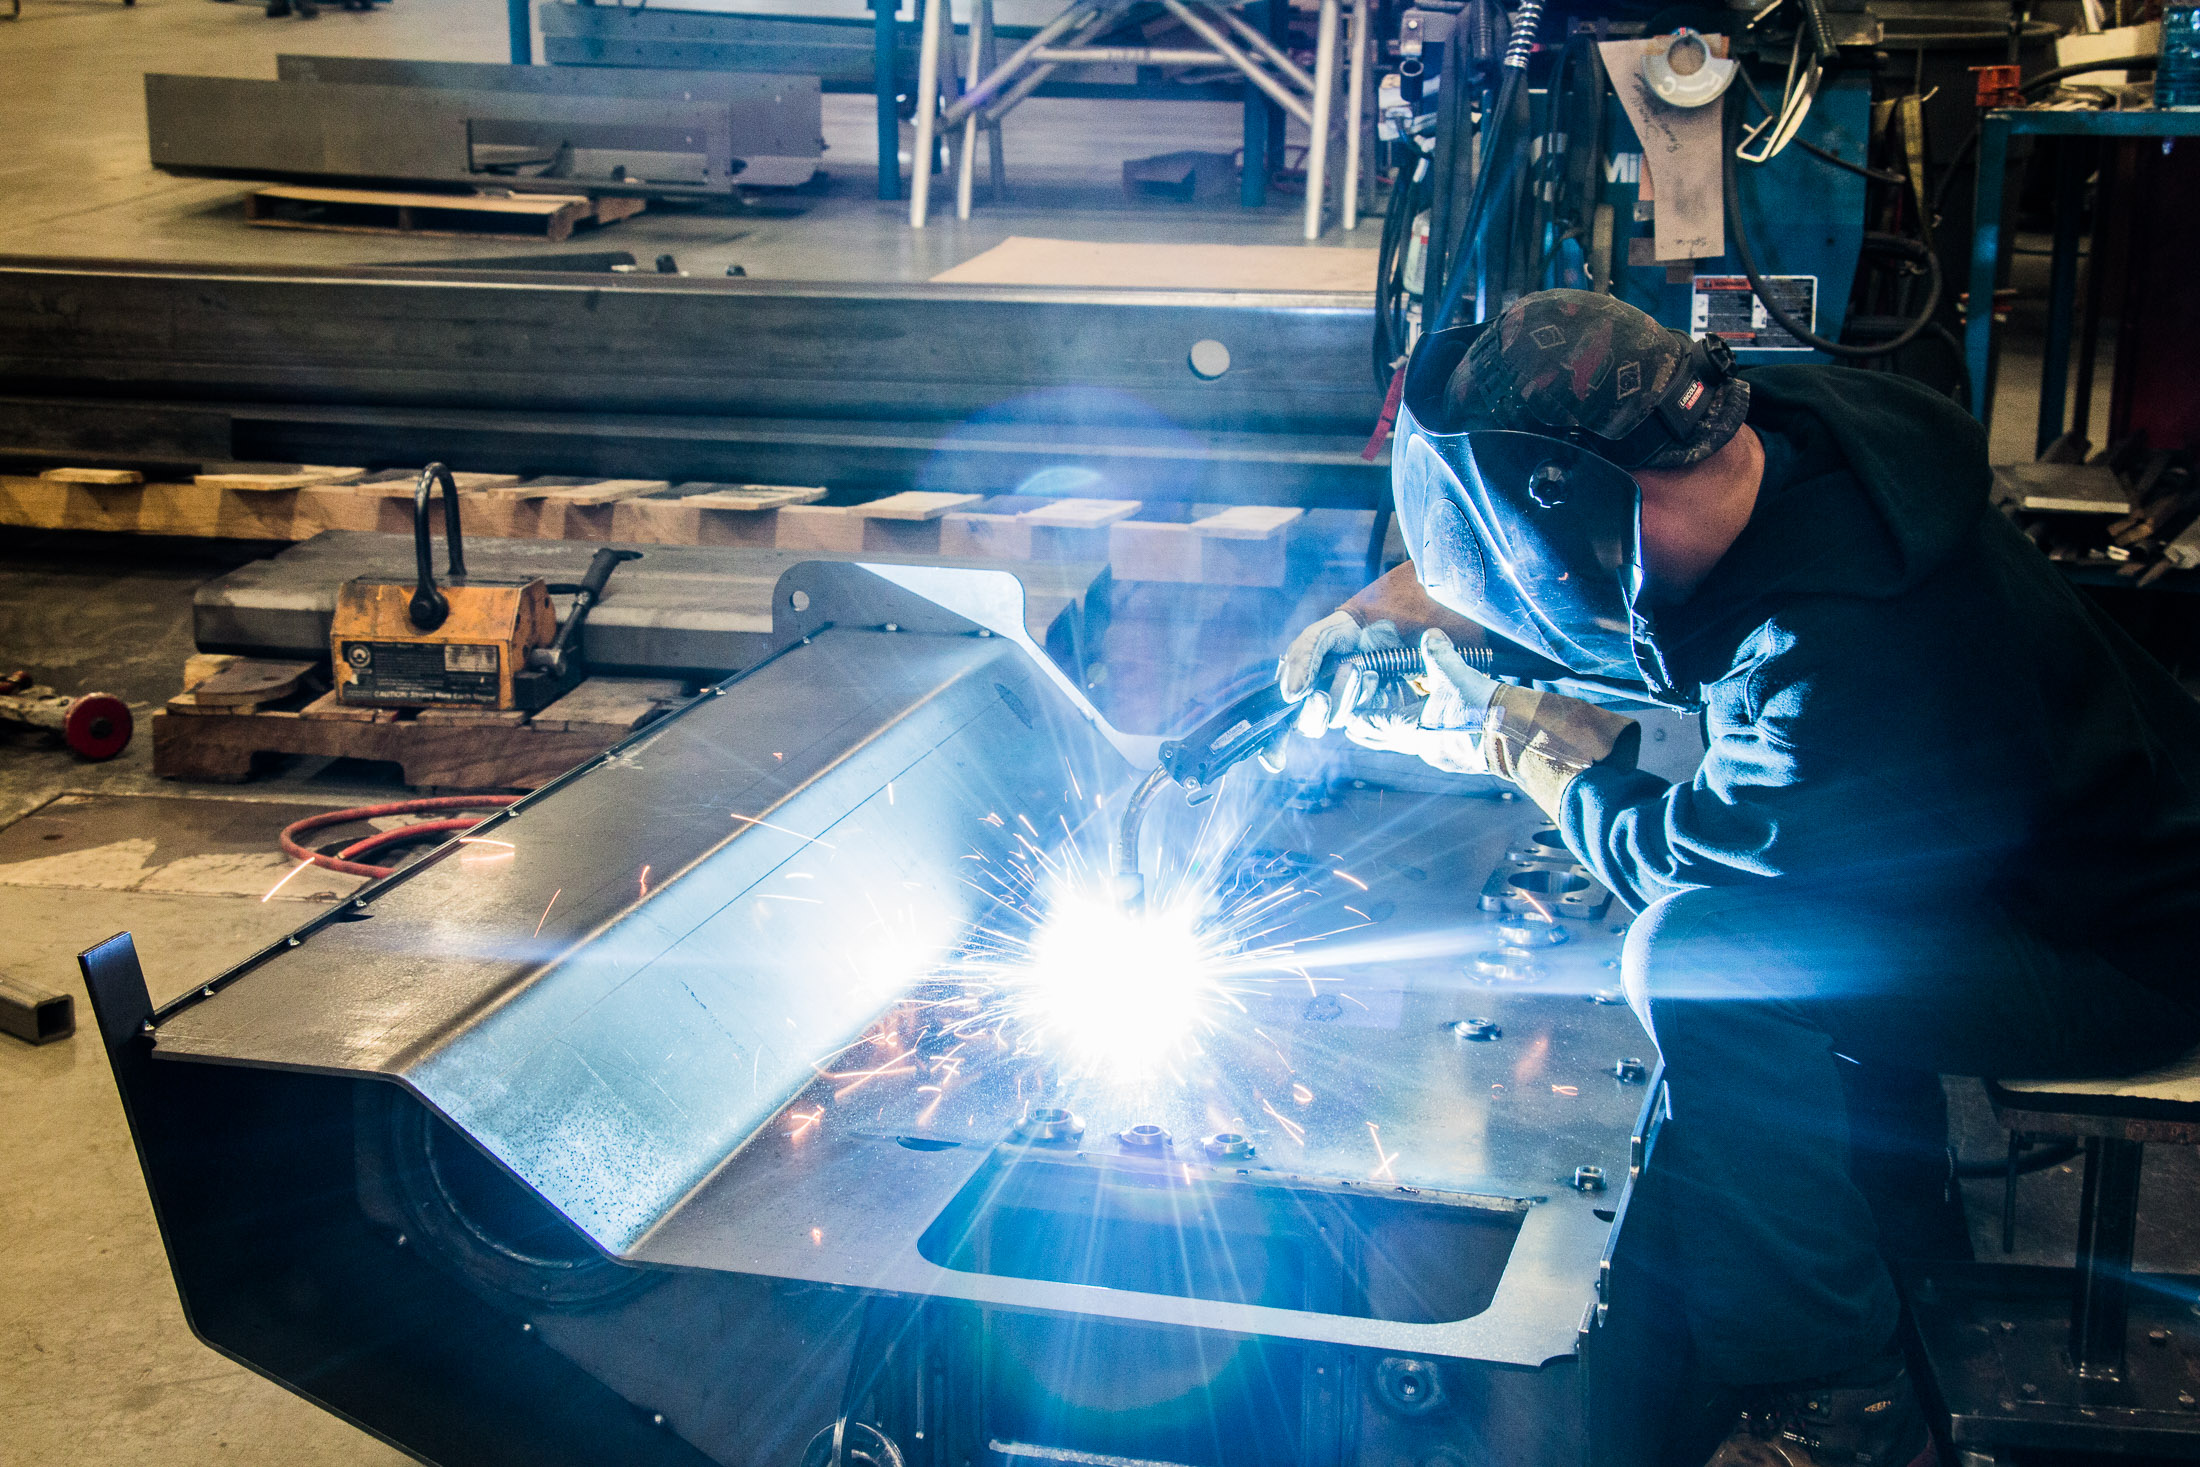 custom fabrication, precision sheet metal fabrication at Badger Sheet Metal Works